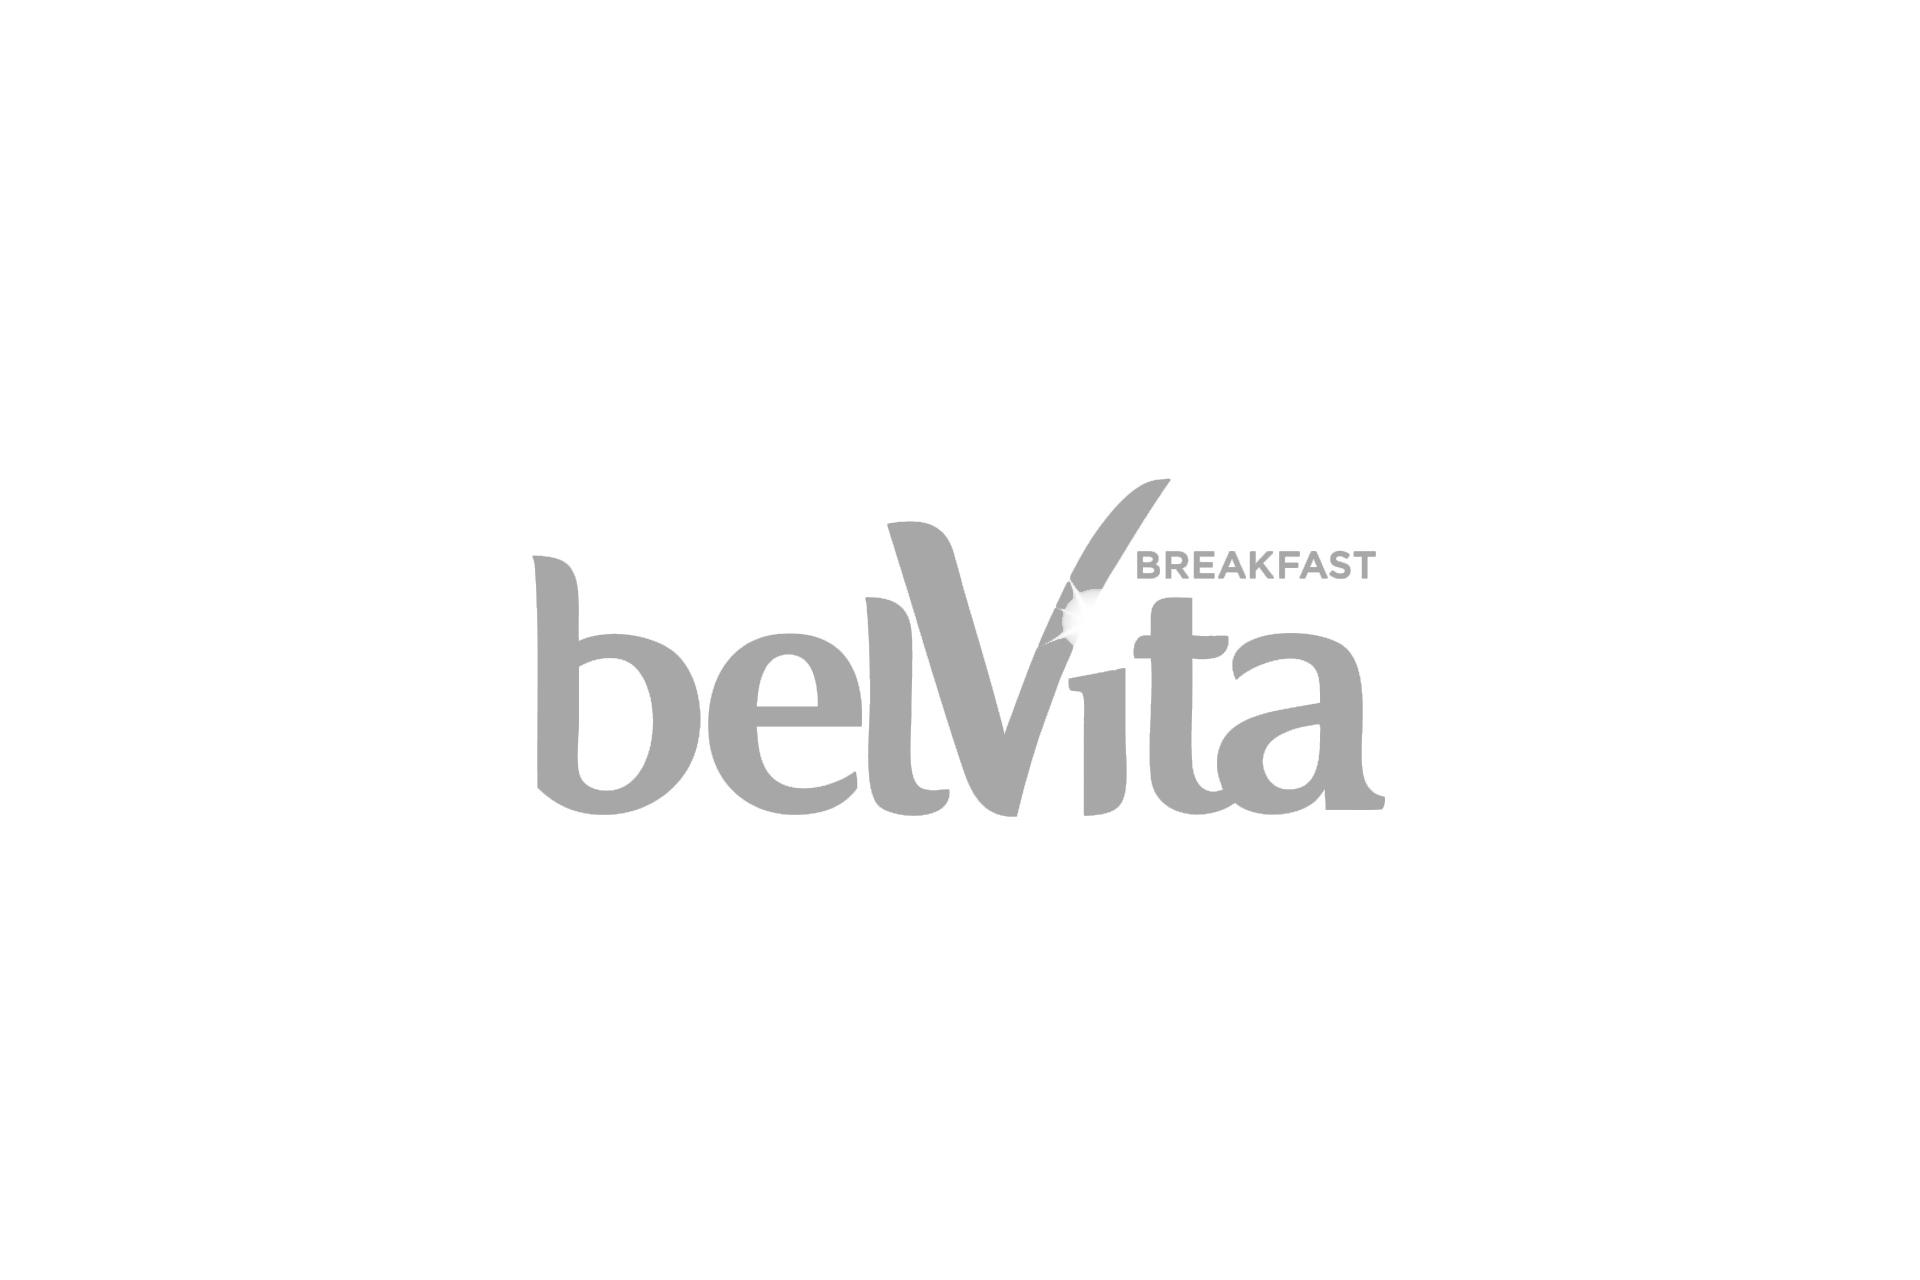 belvita logo grey